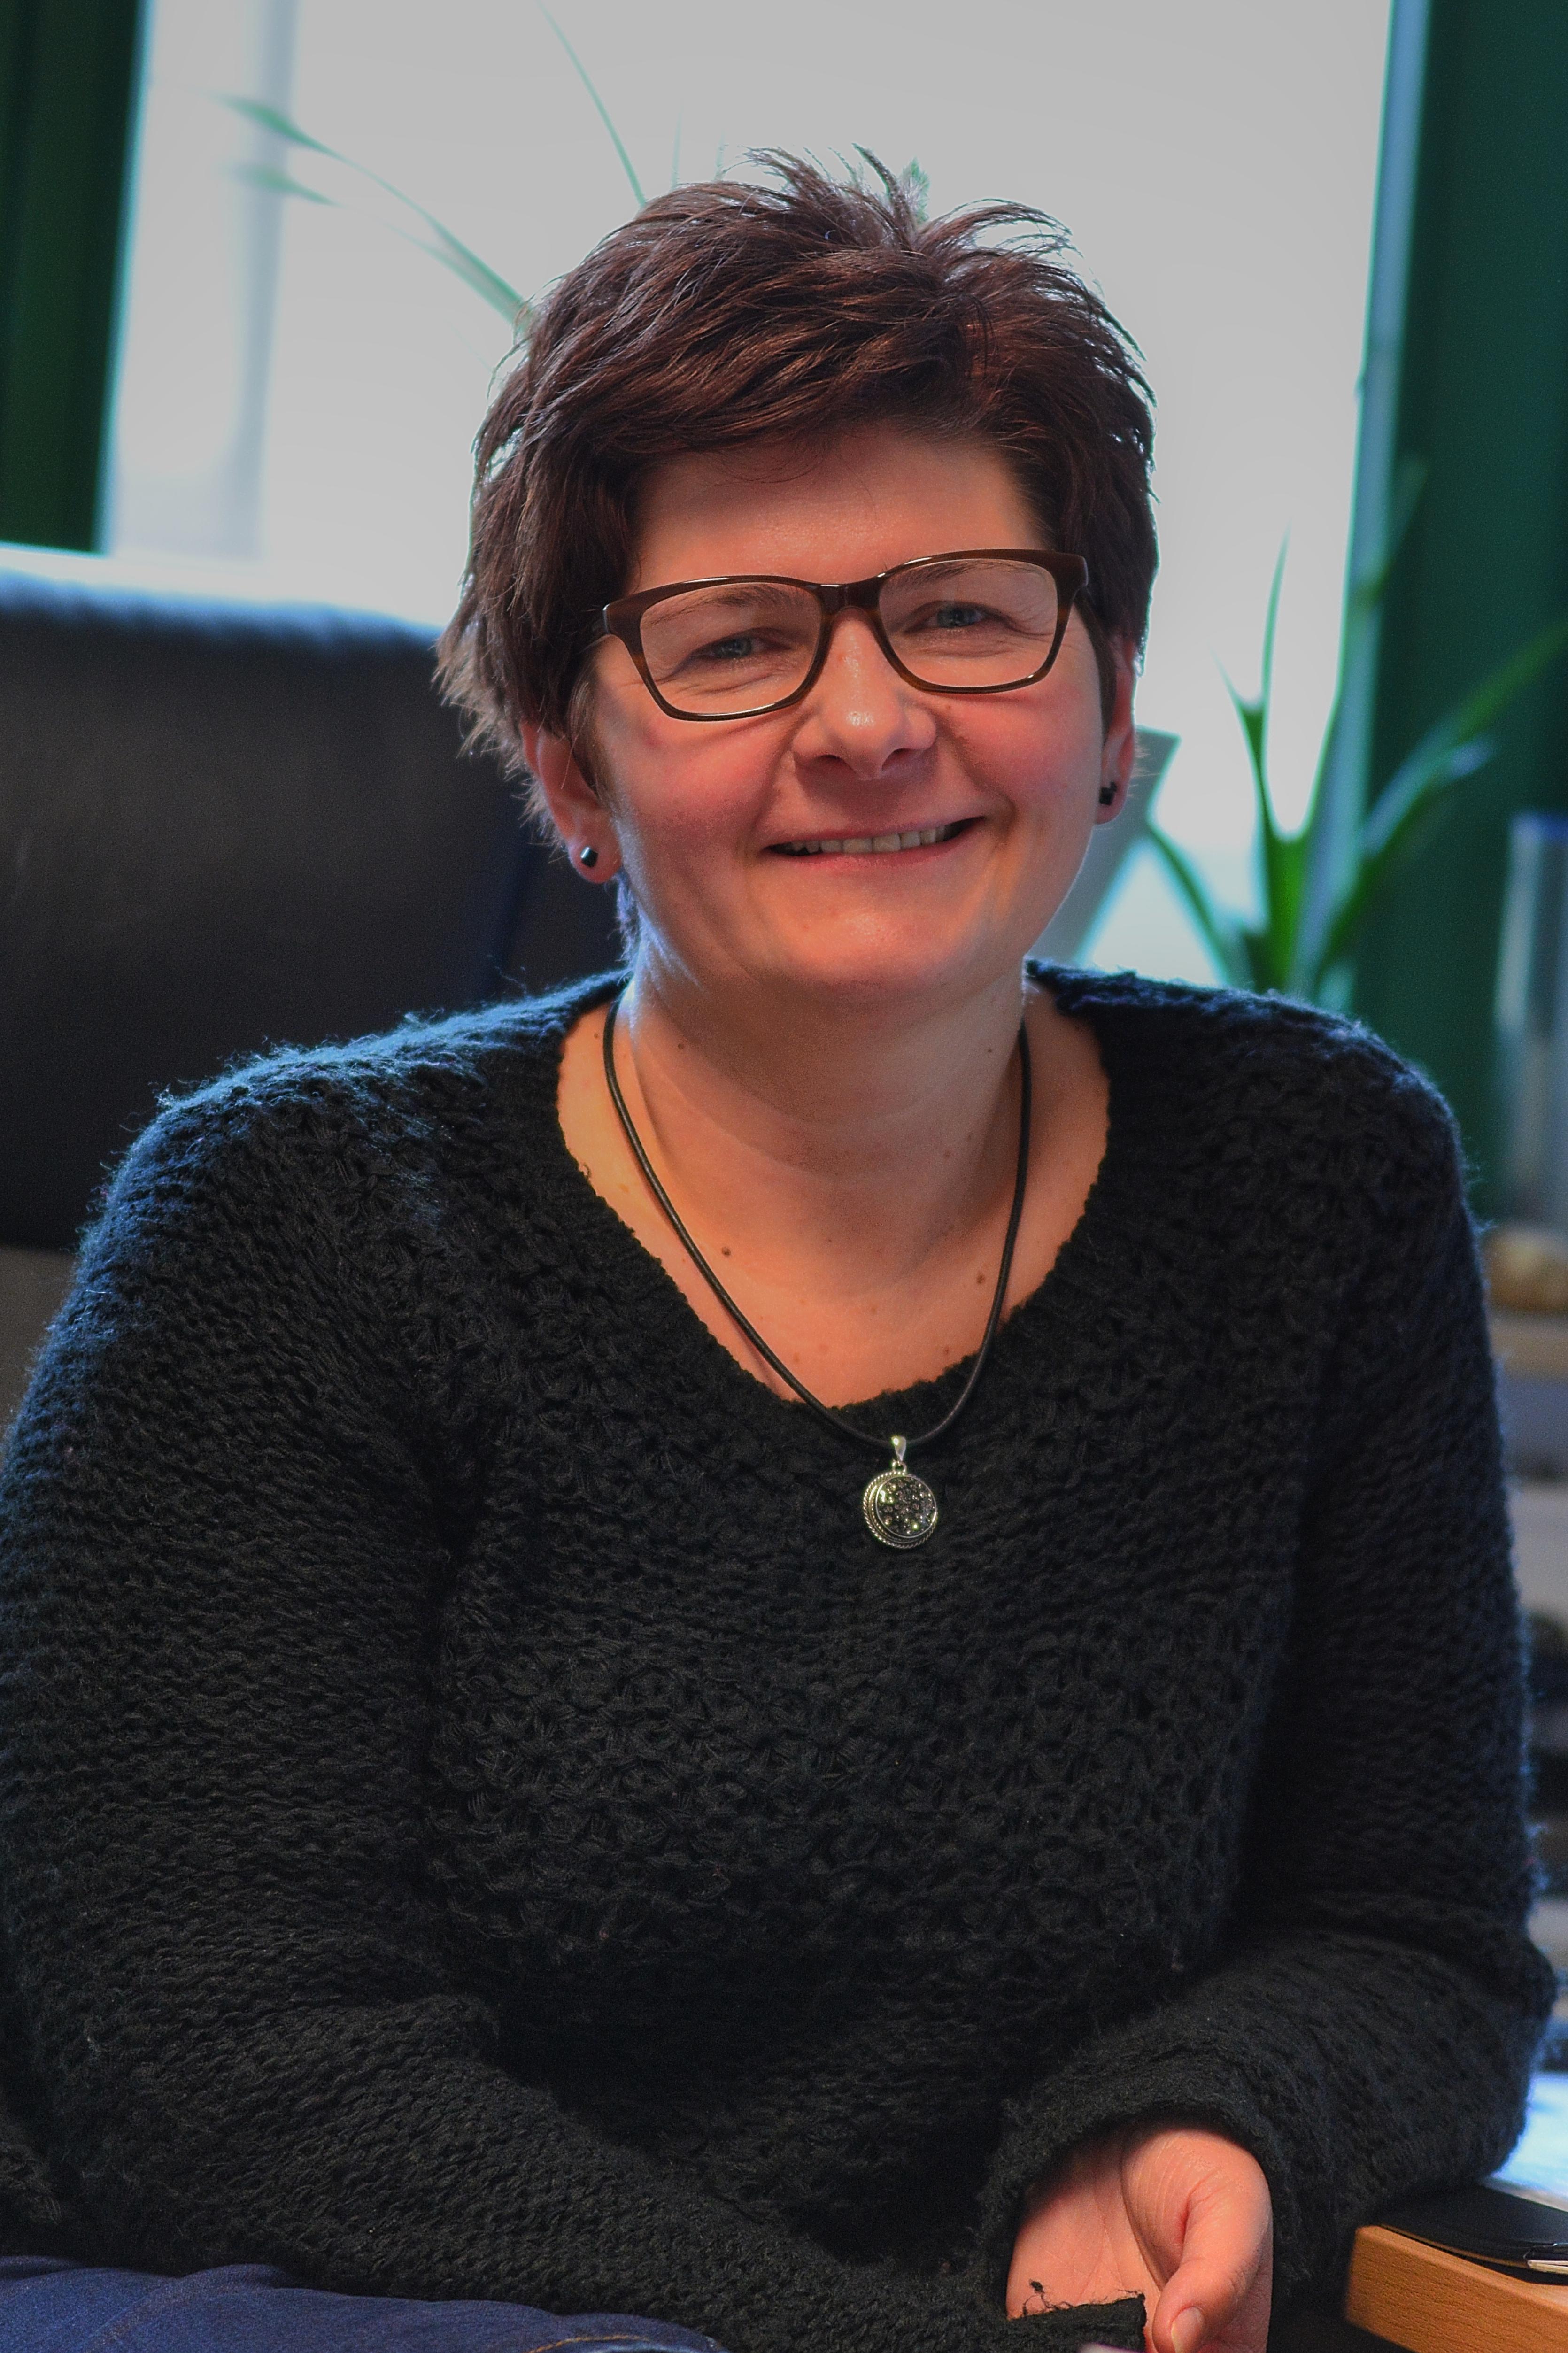 Pani Tabaczyński